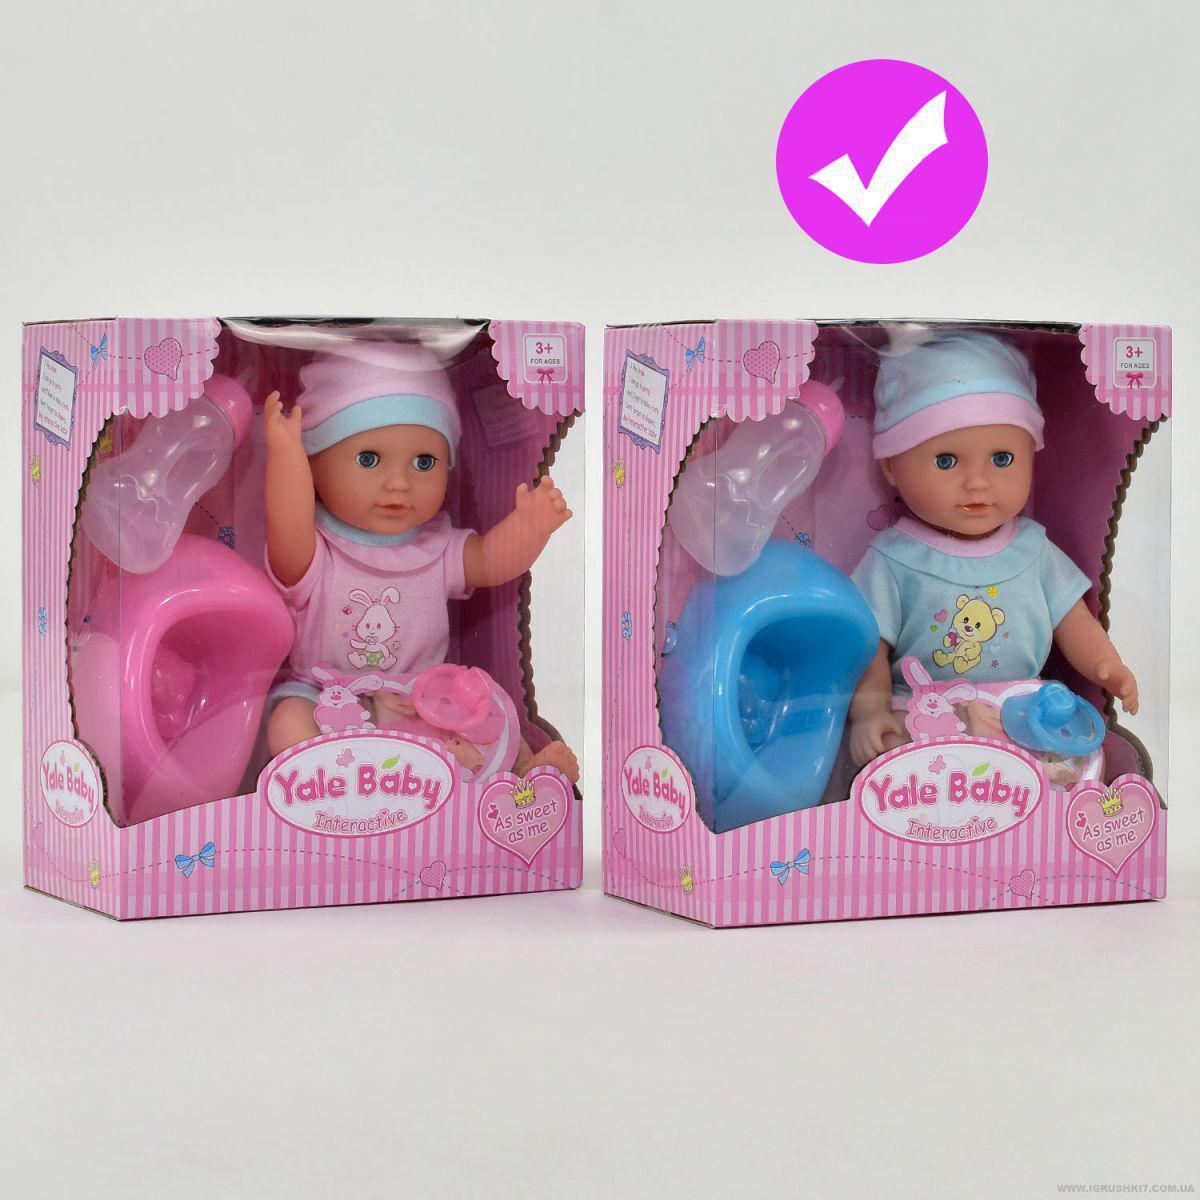 Пупс baby born с аксессуарами, бутылочка, горшок, соска, YL 1731 H